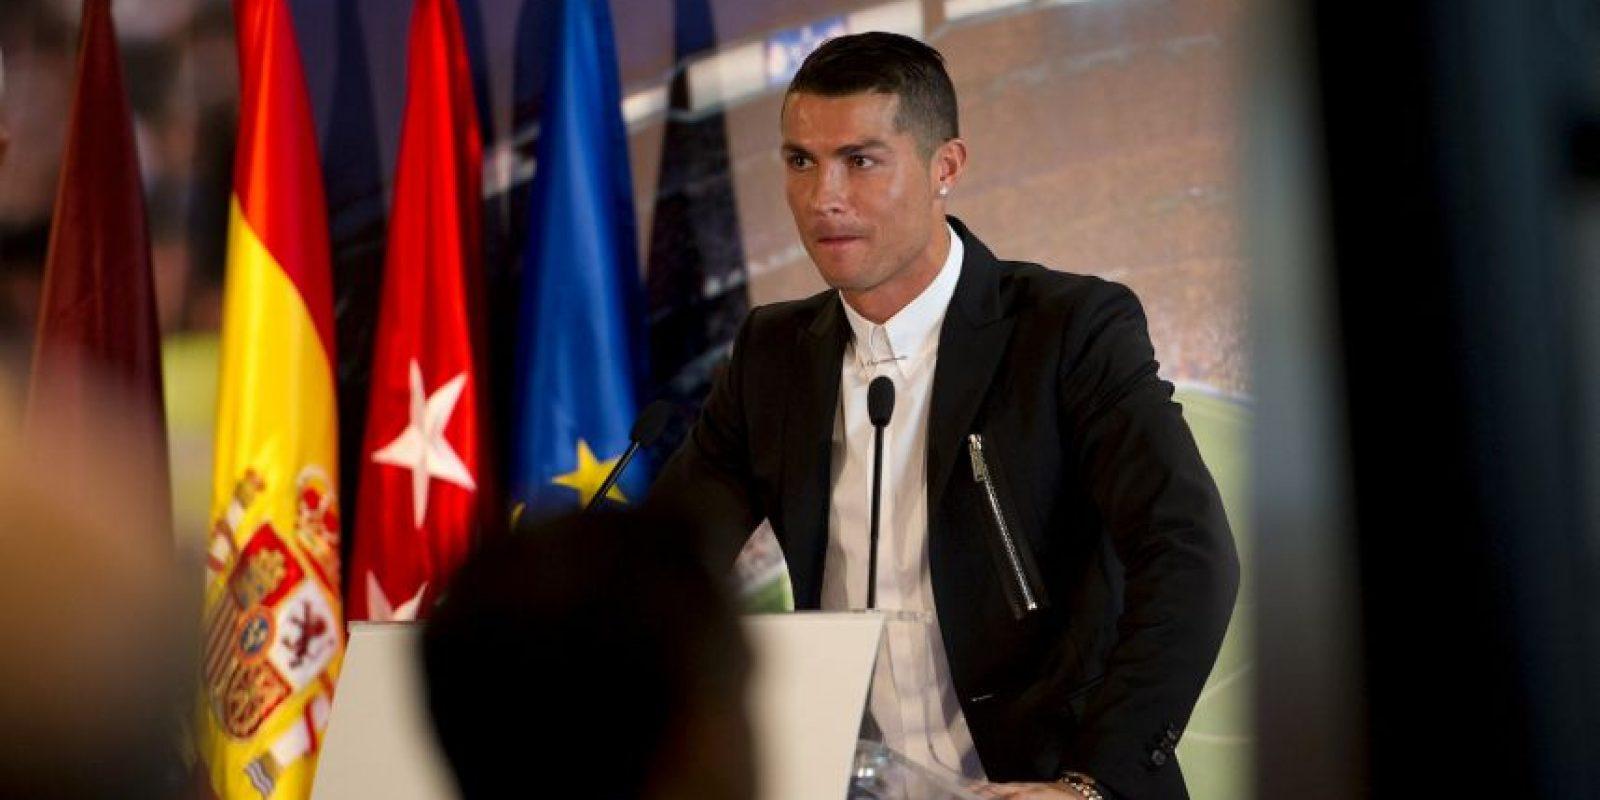 Cristiano Ronaldo ganará 23.6 millones de euros por temporada Foto:Getty Images